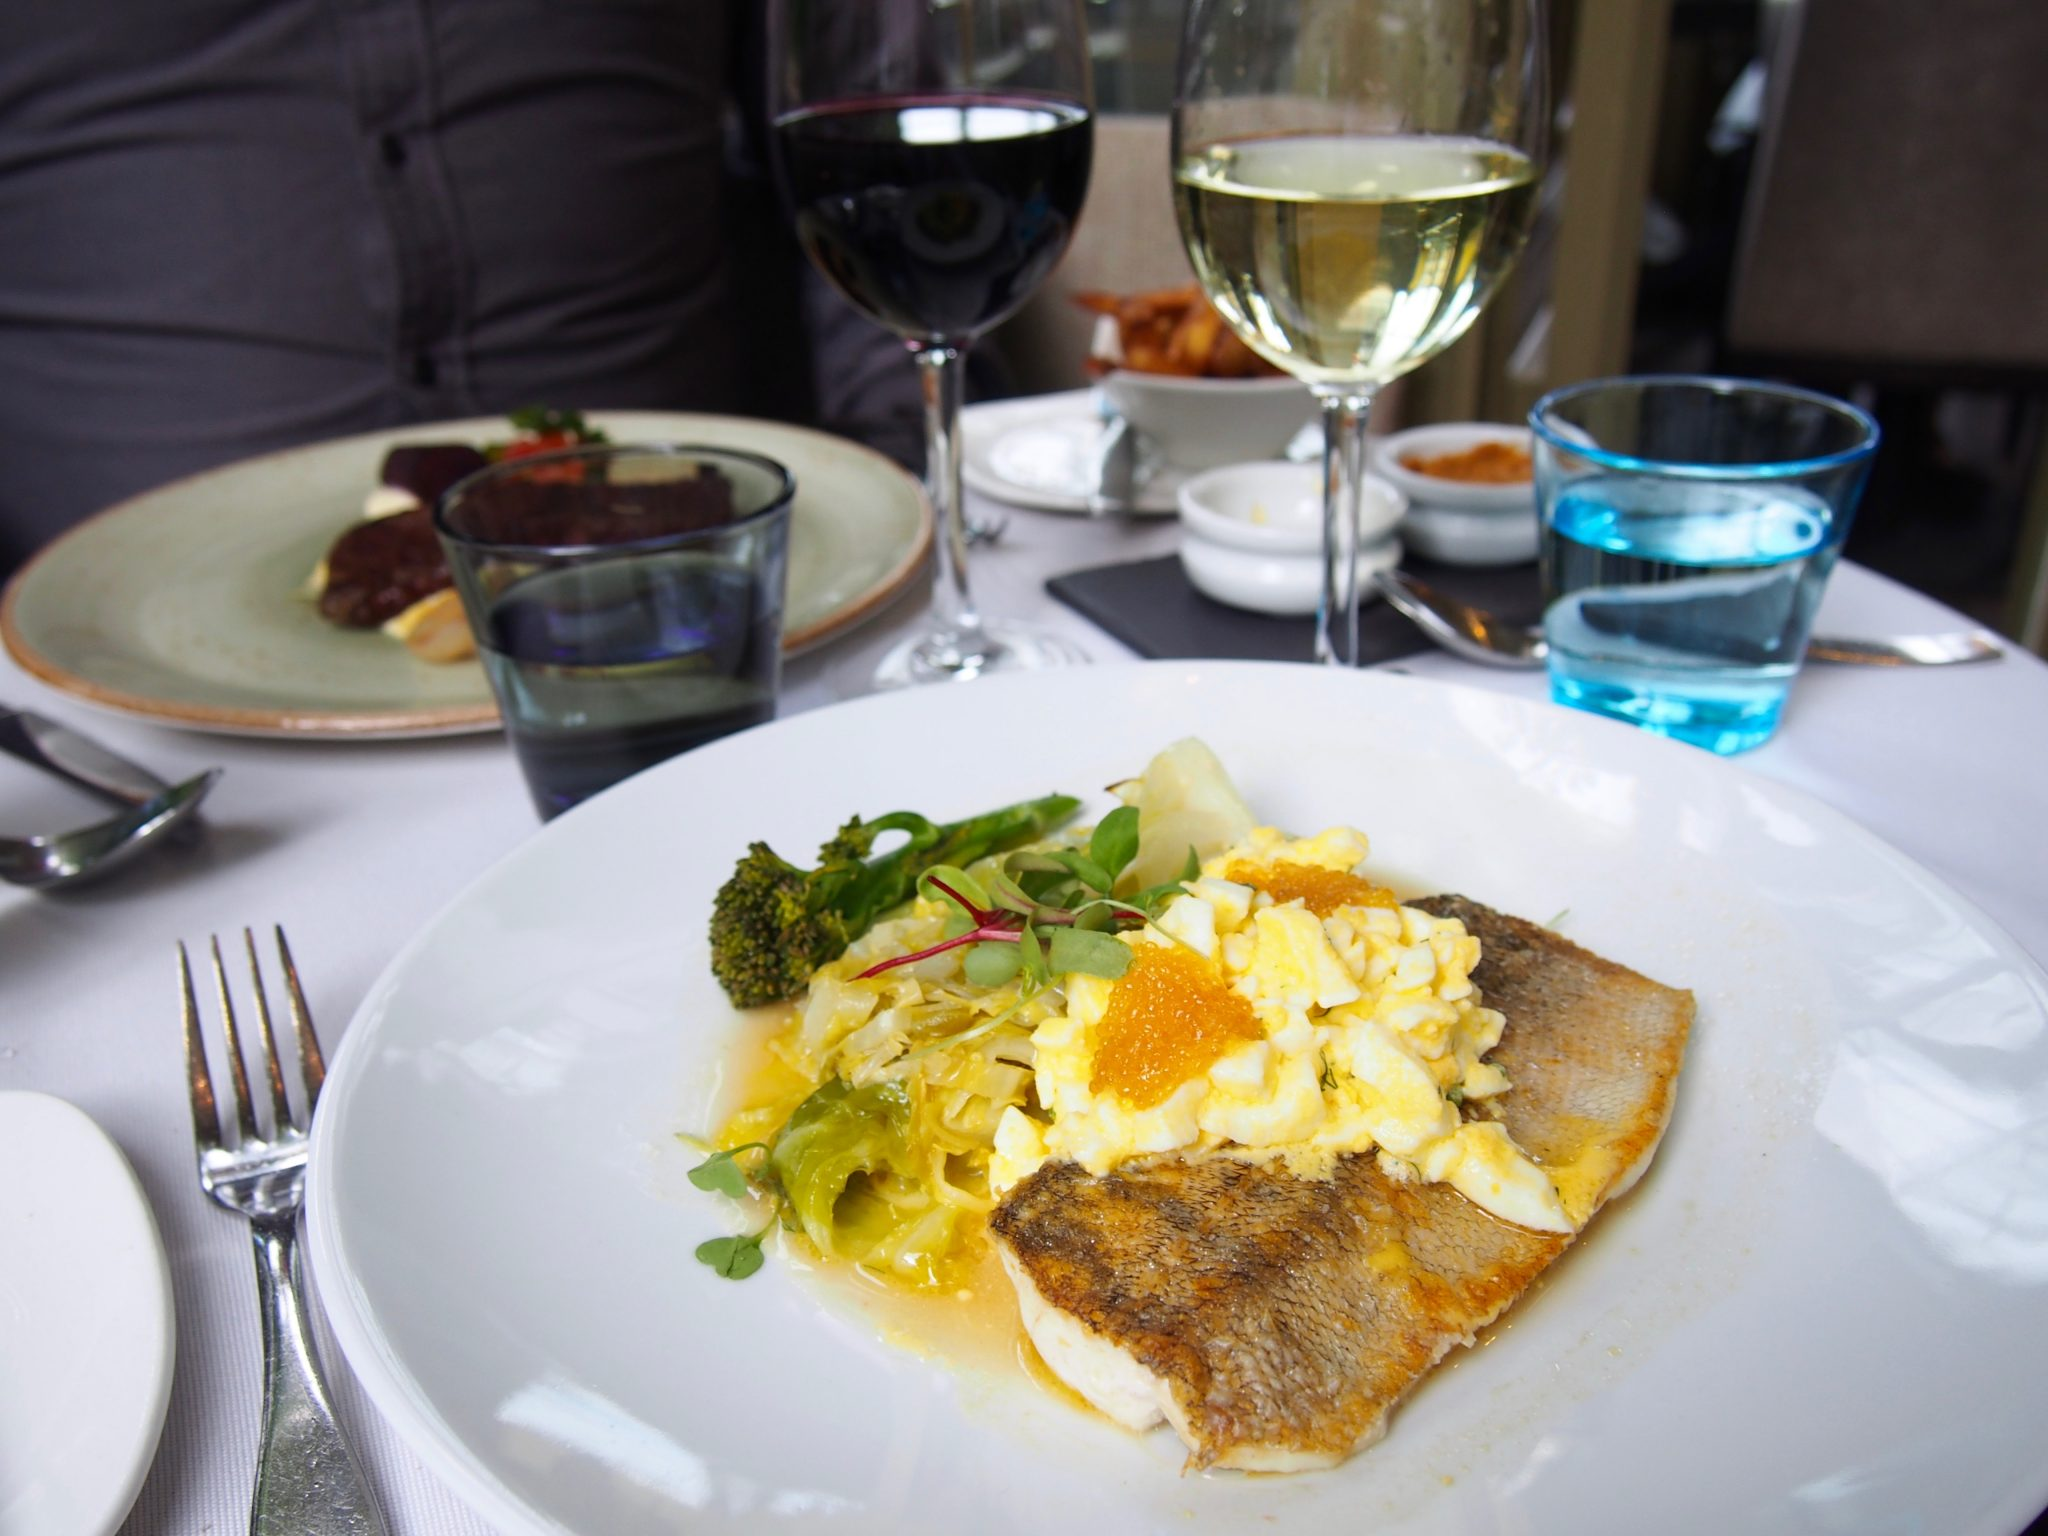 Ravintola Kappeli kuha